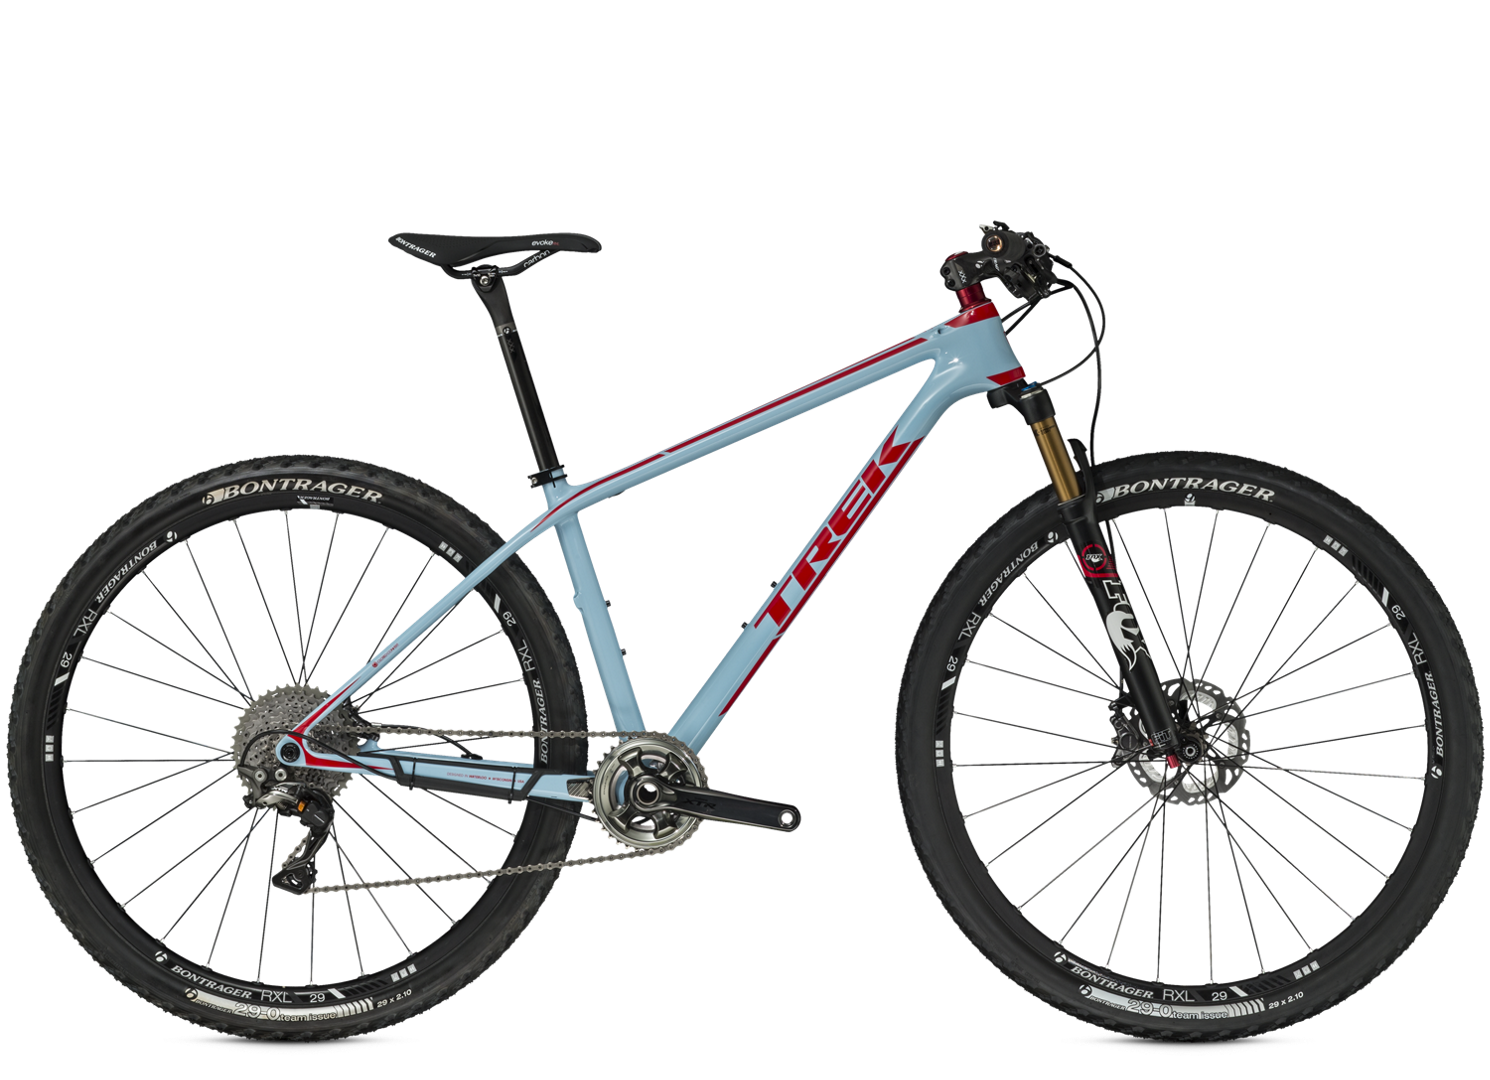 Superfly 9 9 Sl Xtr Trek Bicycle